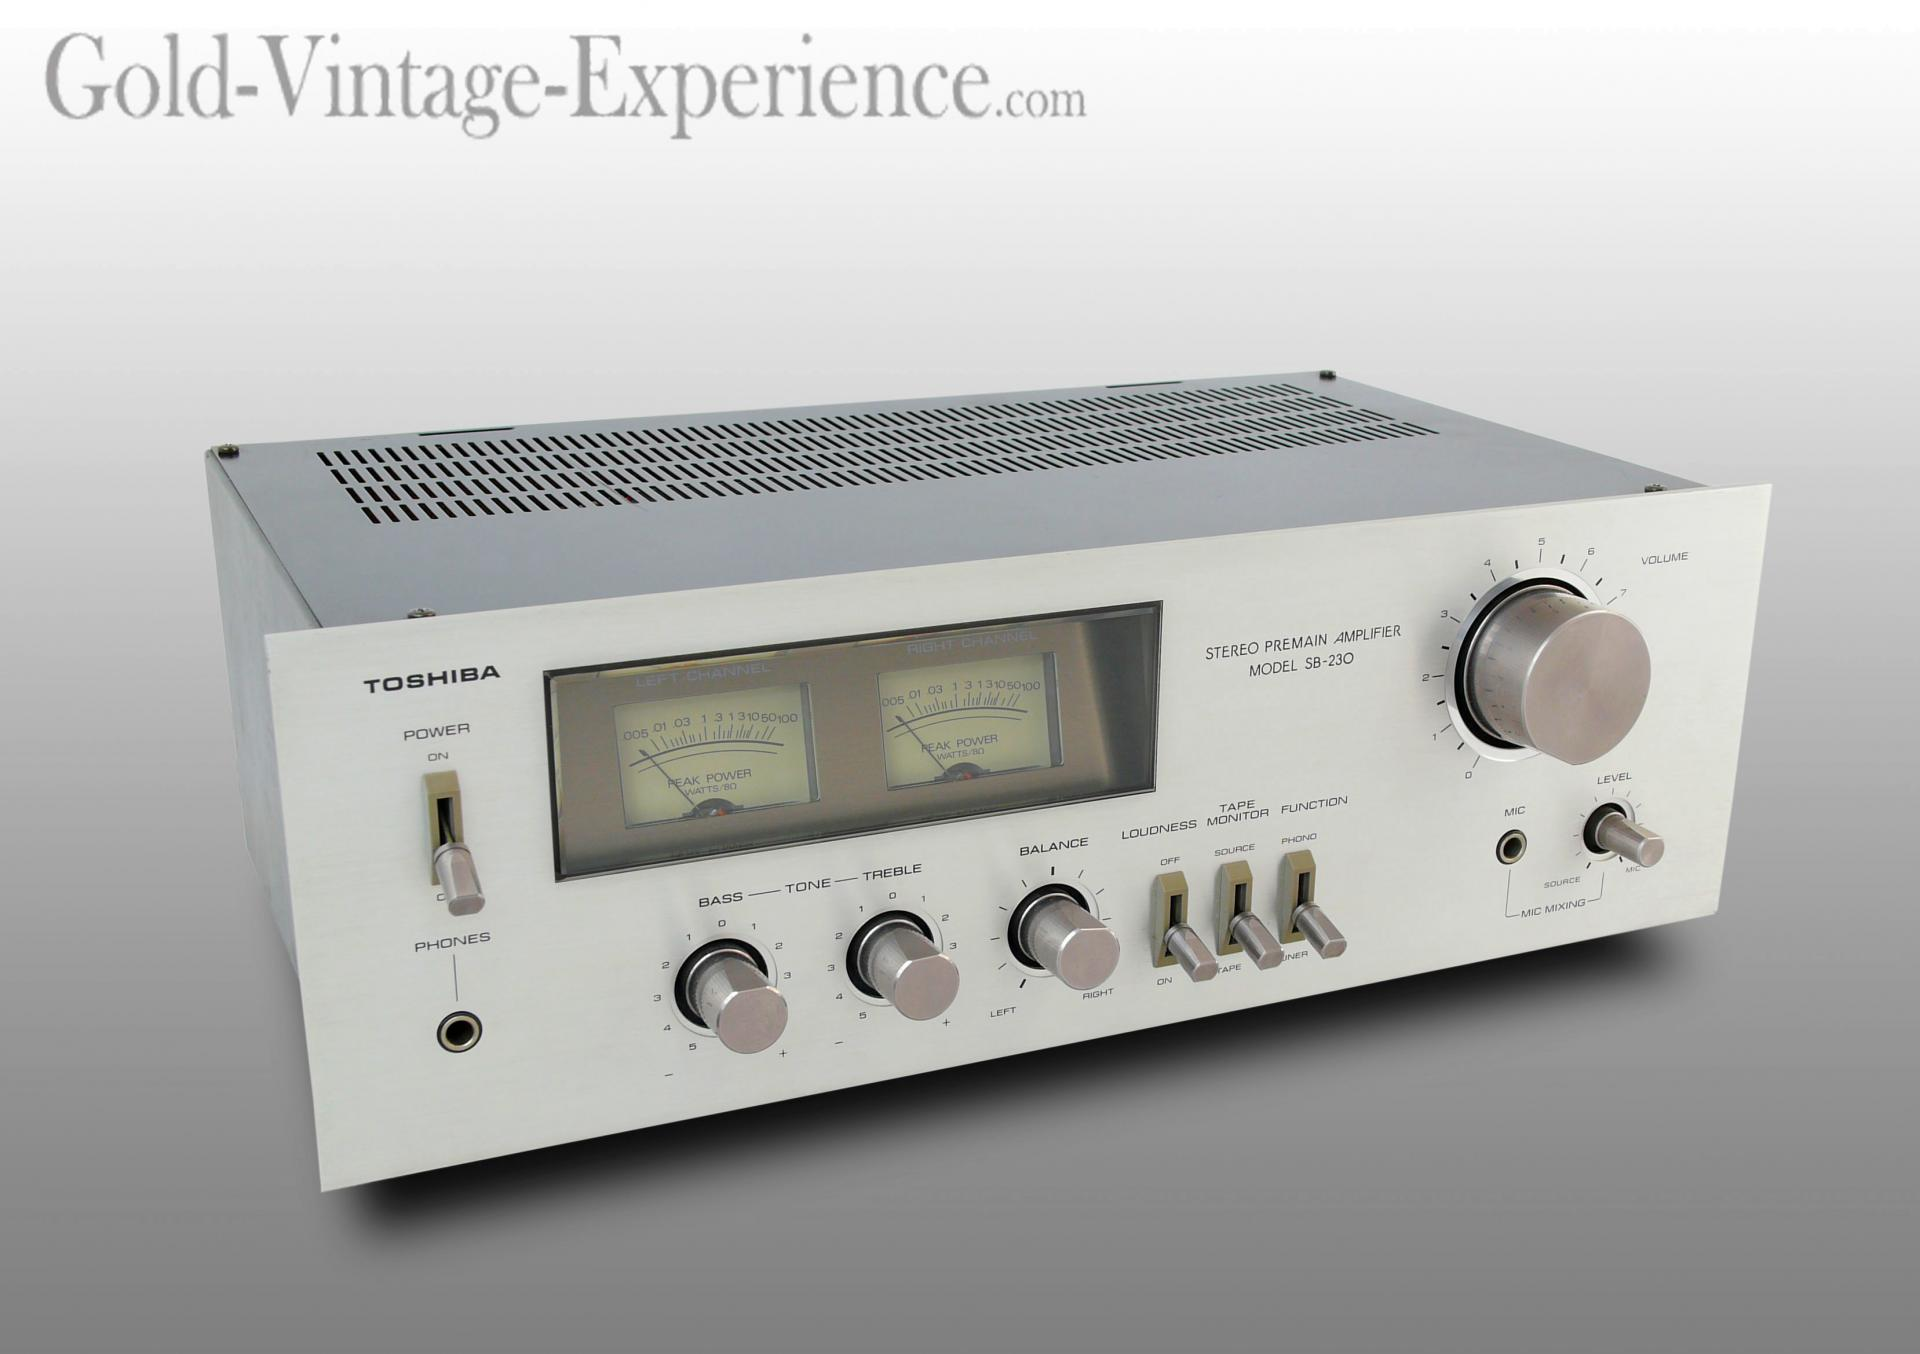 Toshiba sb 230